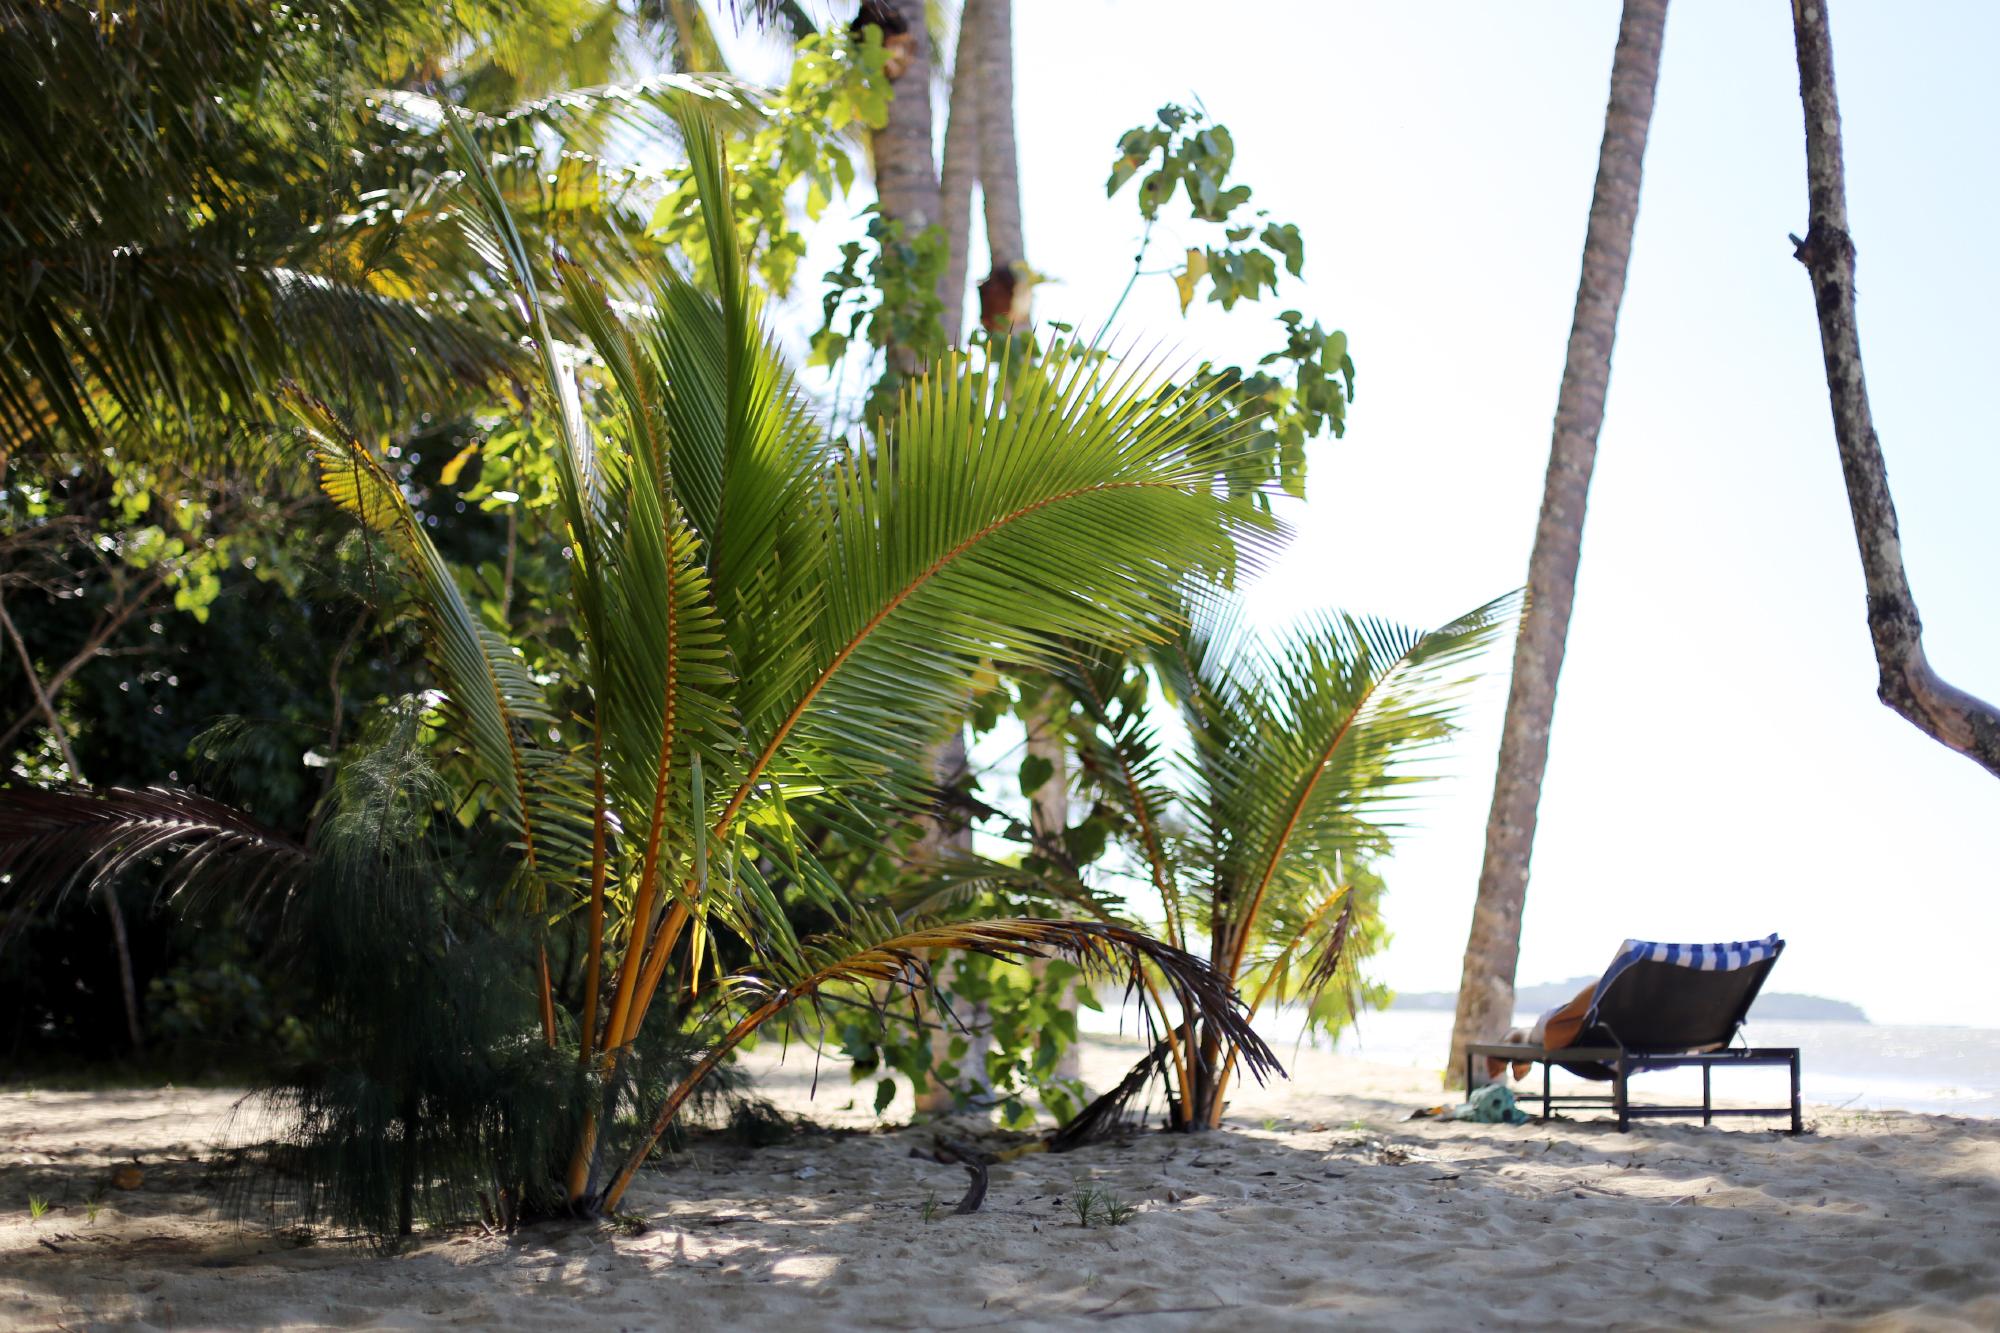 kewarra beach dag ett 12